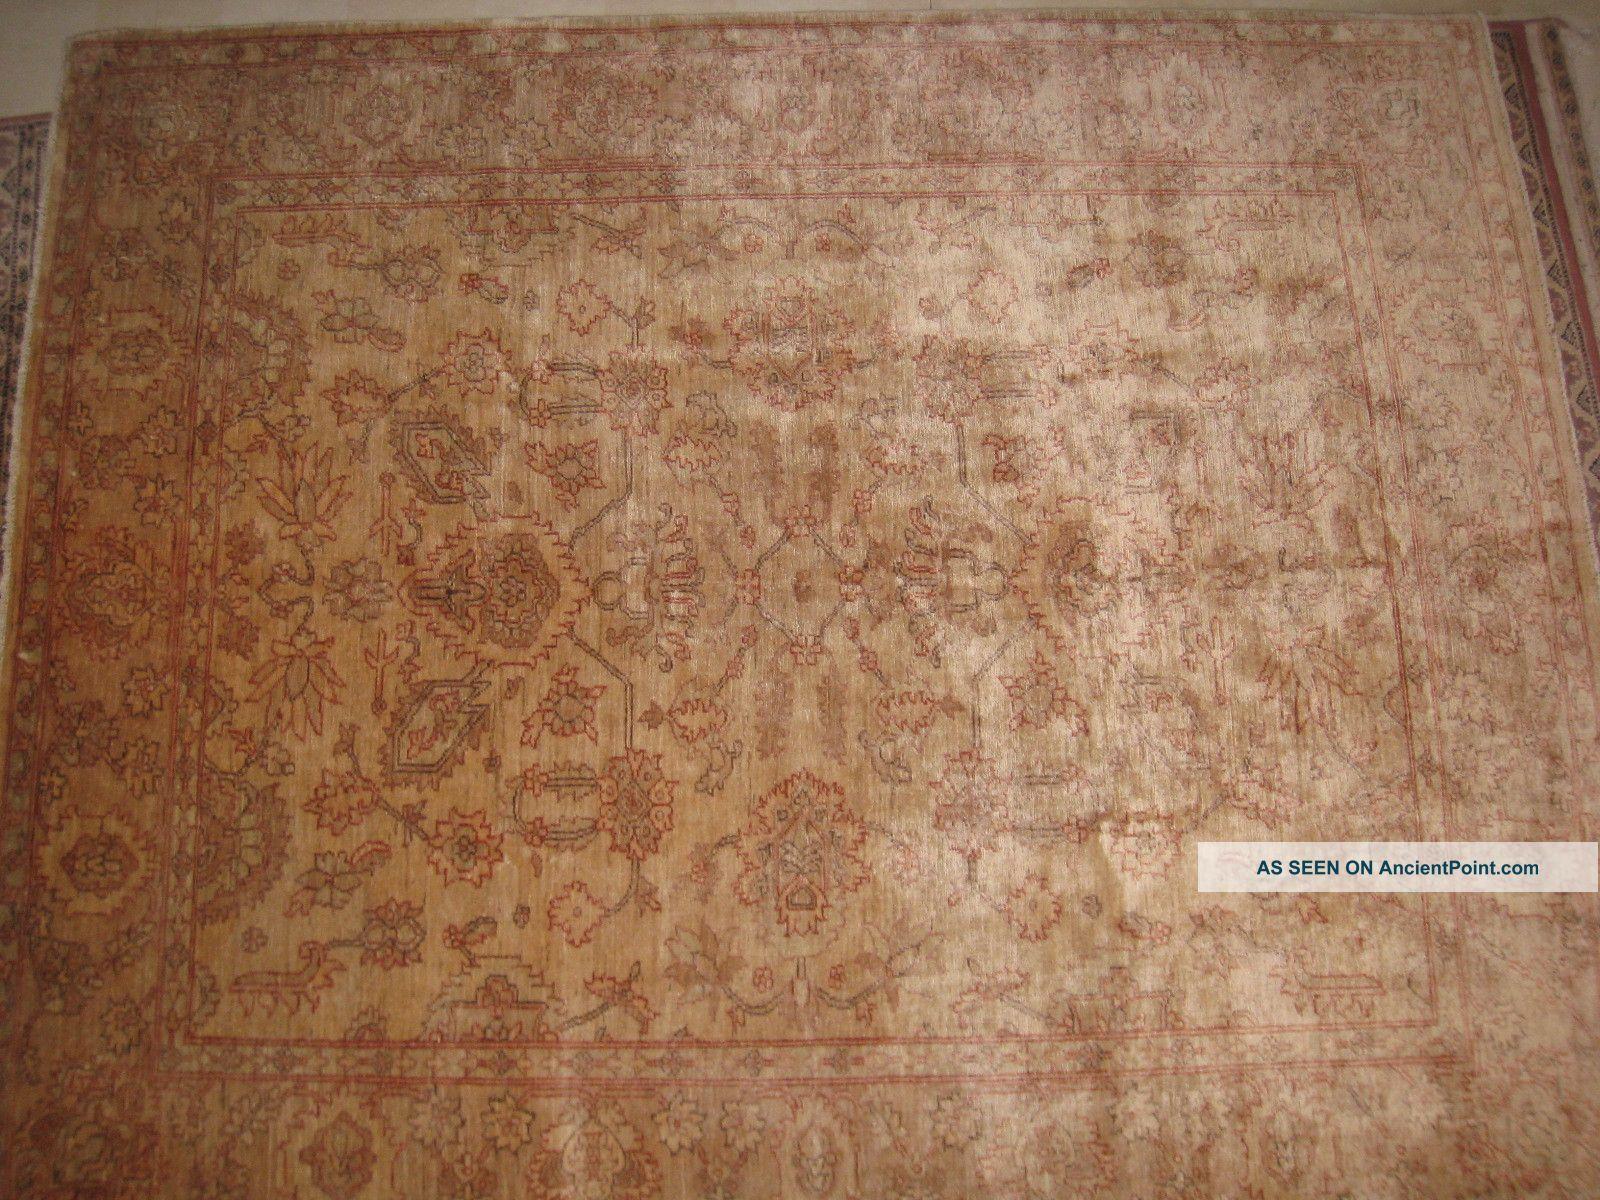 7 - 77 X6,  77 Veg Dyed Peshawar Carpet Antique Design Near Eastern photo